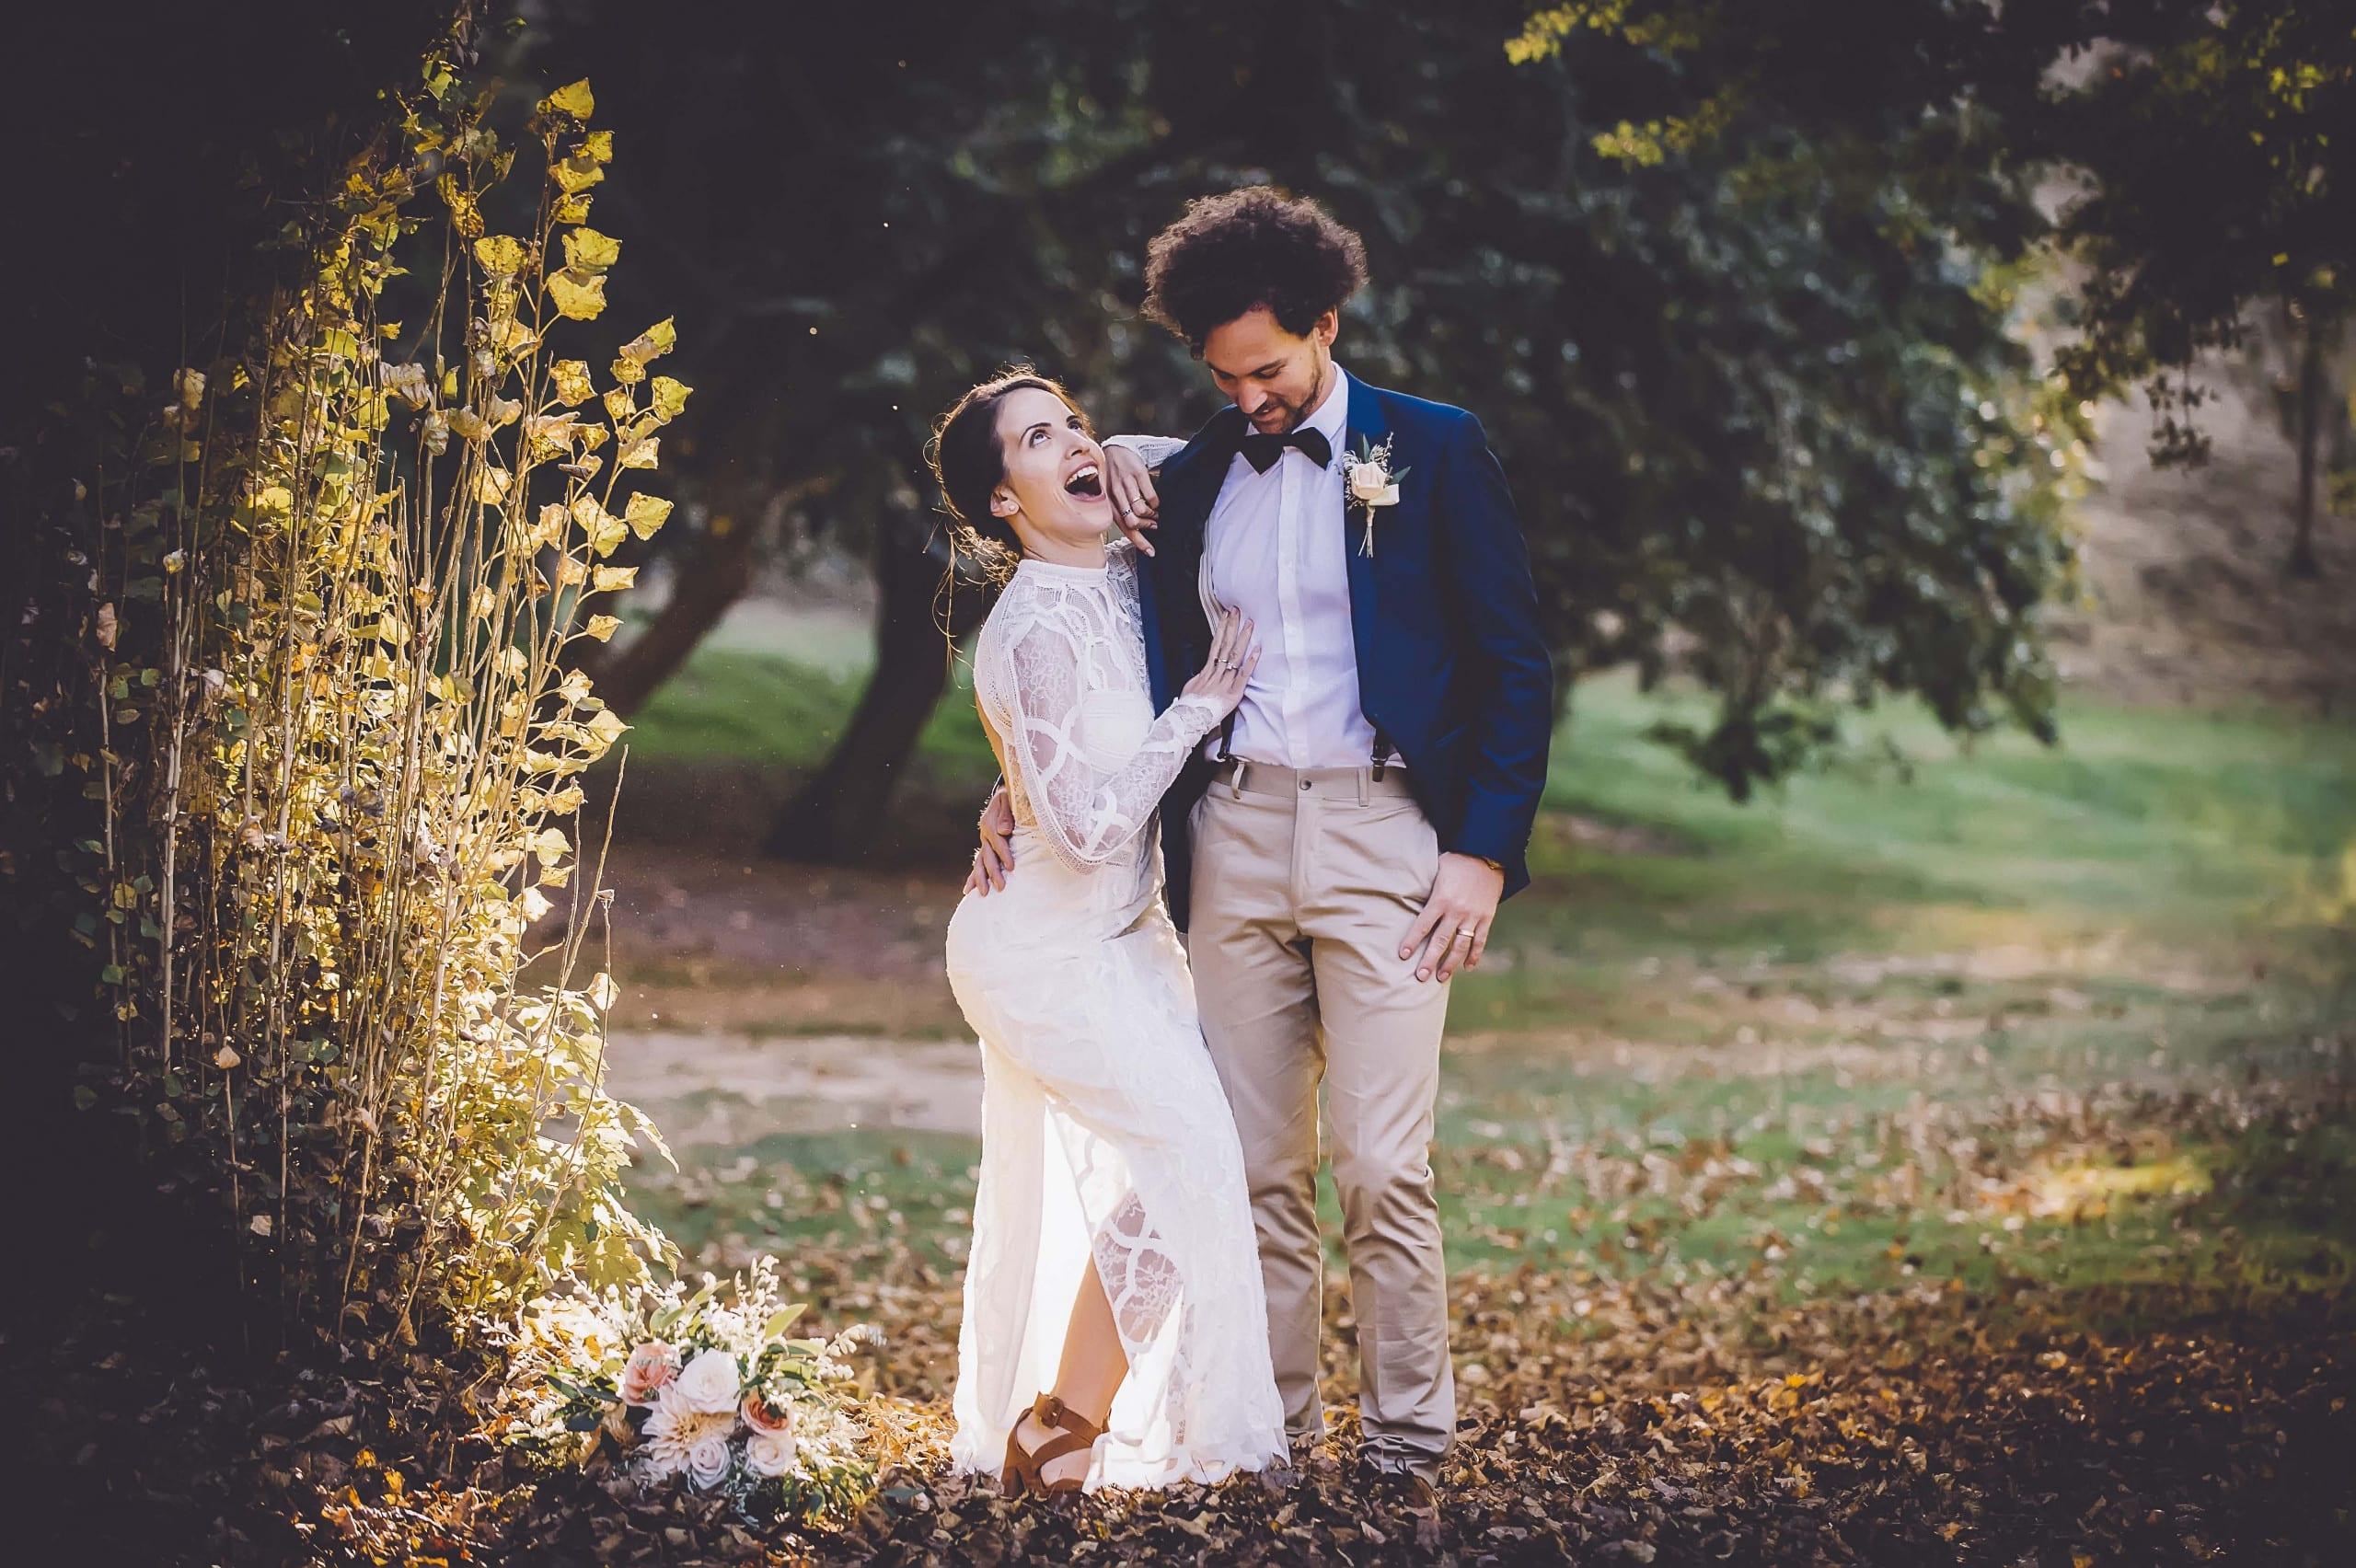 Andrea + Pat   A Stunning Thurlby Domain Wedding fallon photography